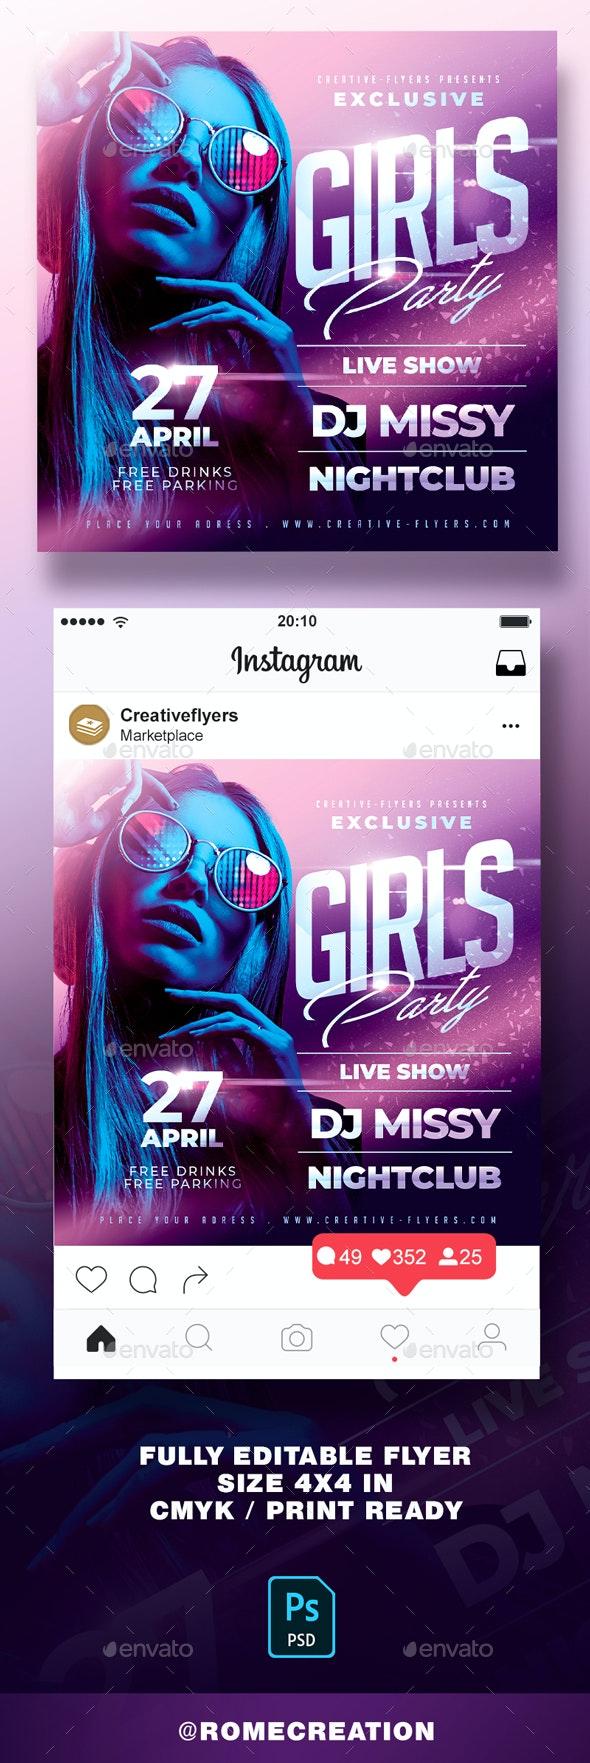 Girls Party Nightclub Flyer